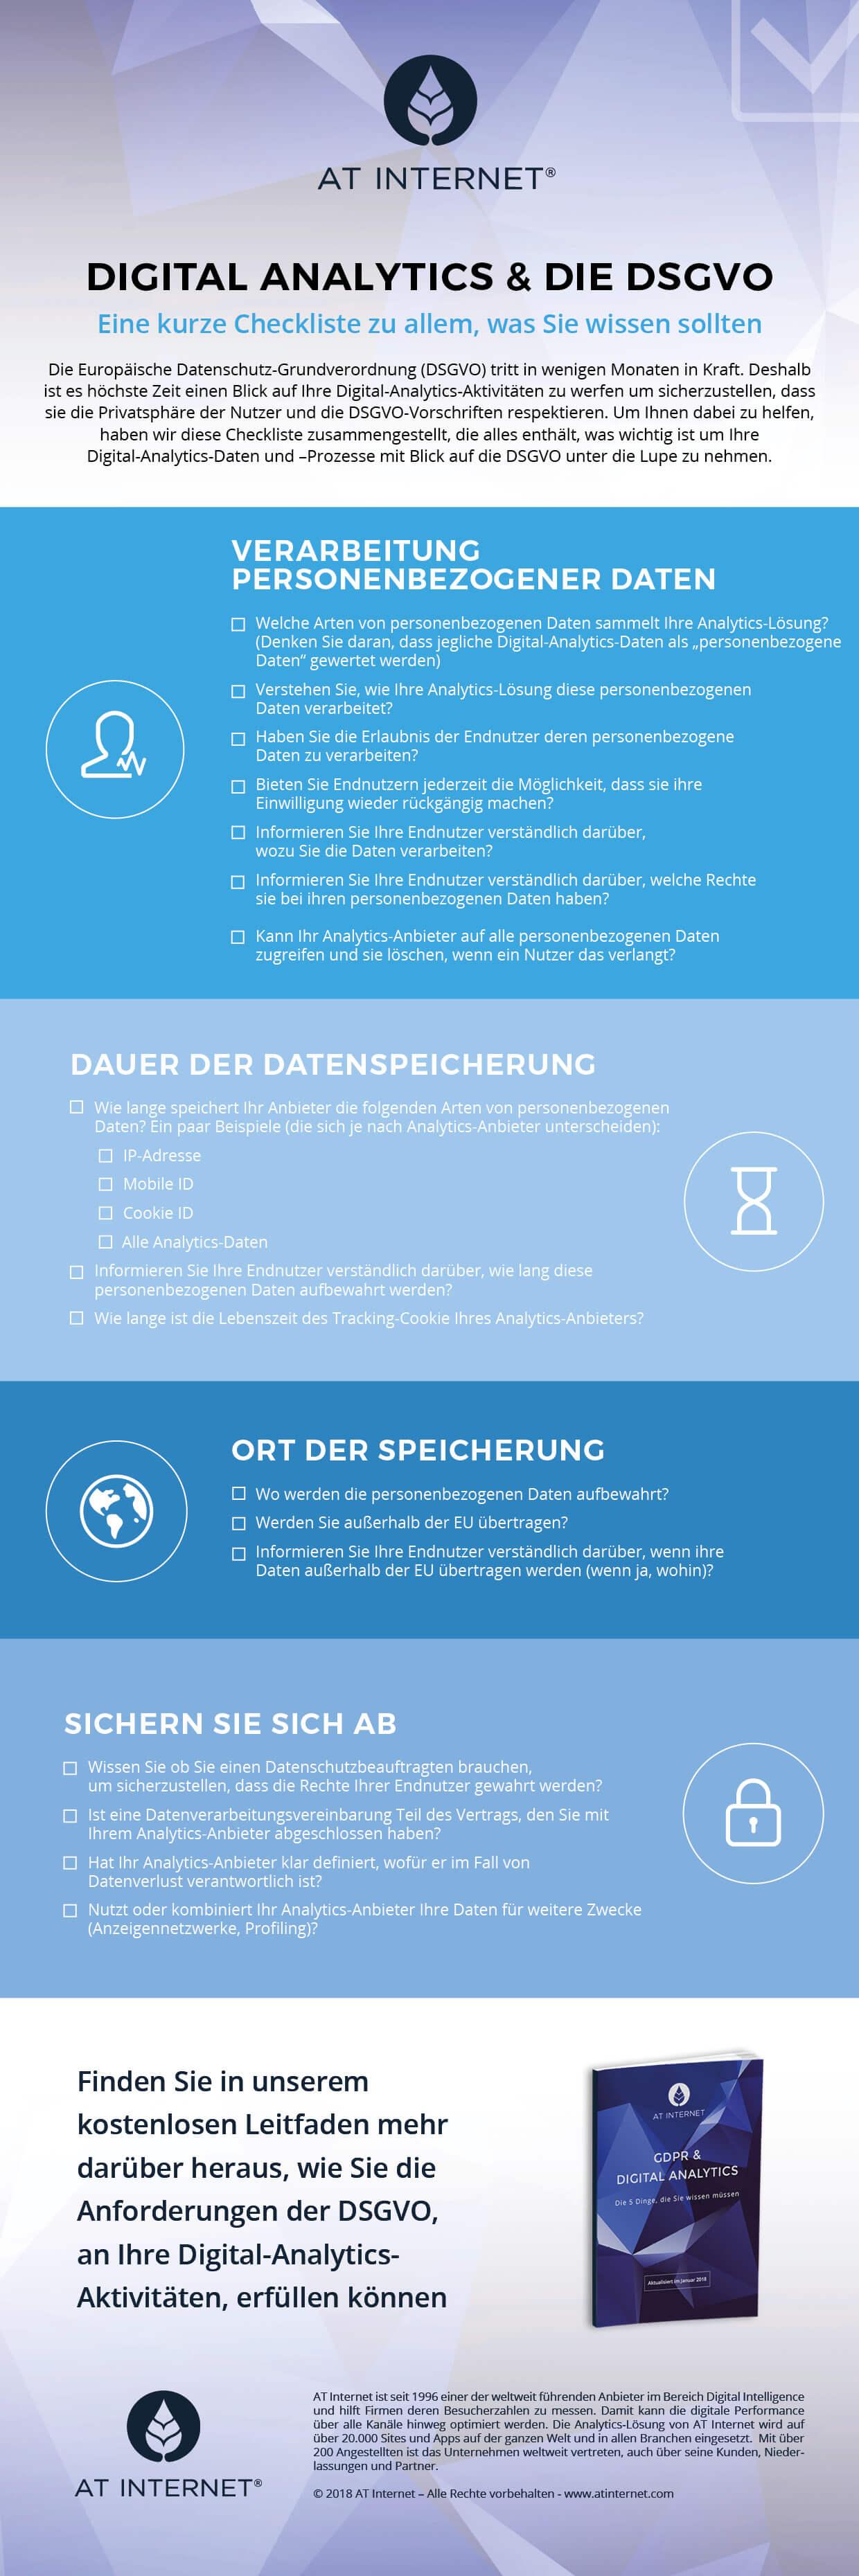 digital-analytics-gdpr-checklist